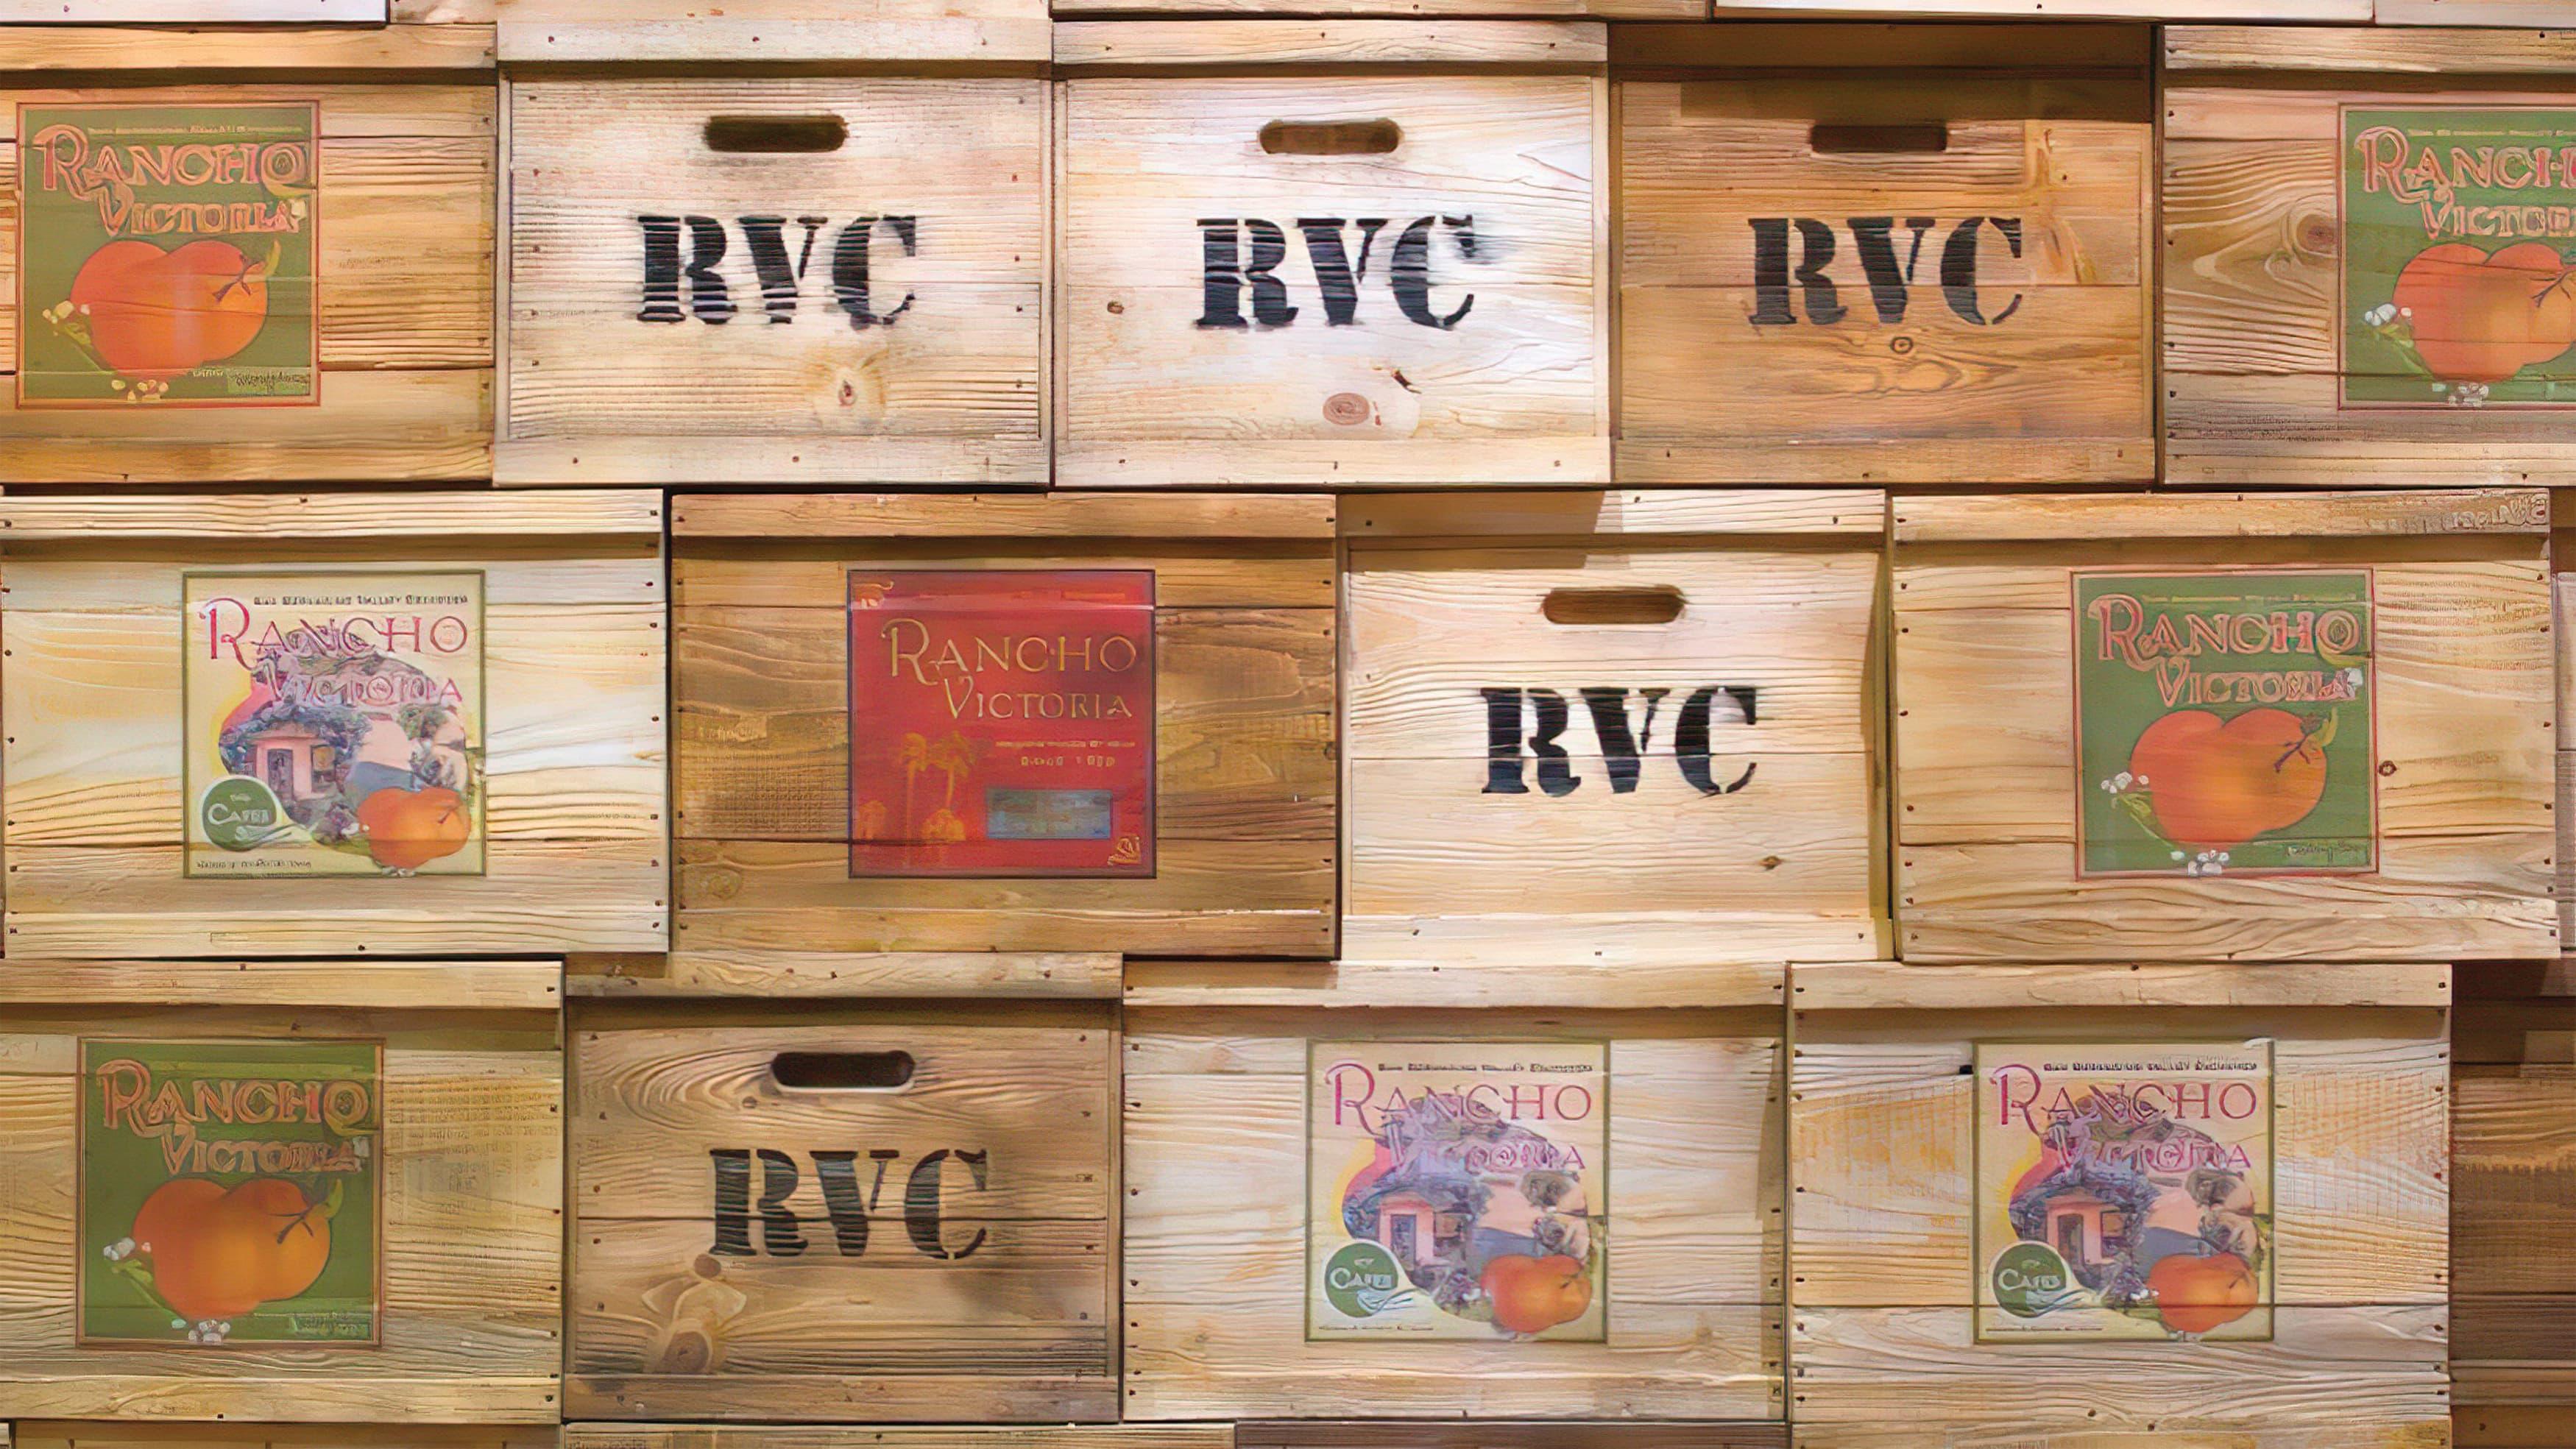 Rancho Victoria Foodhall public art prepared by RSM Design